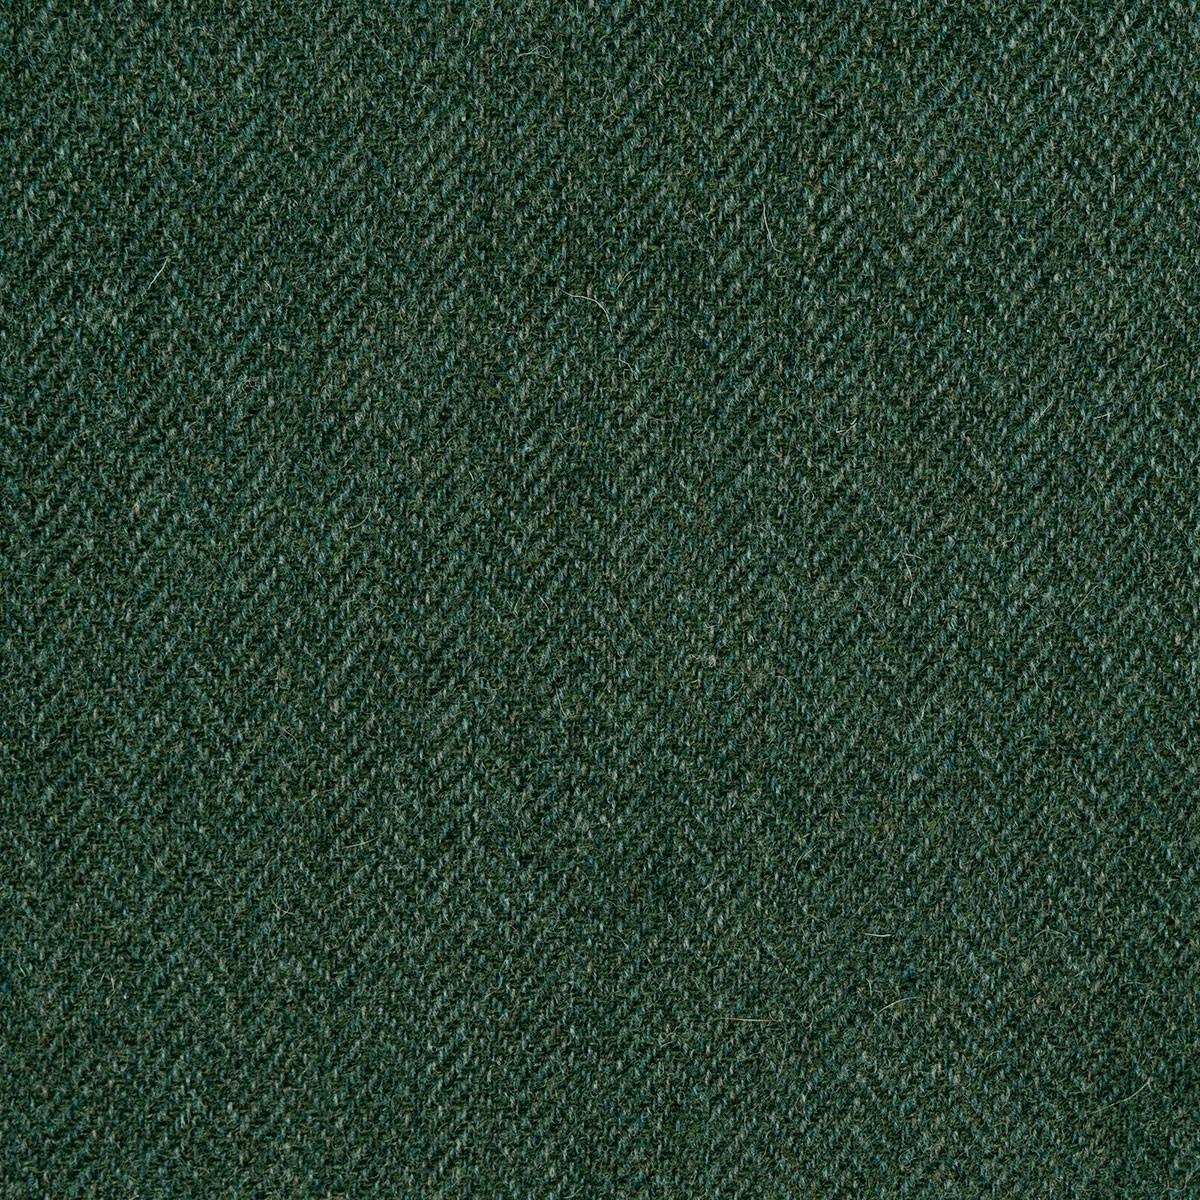 state Managers Green Shetland Jacketing Tweed Fabric